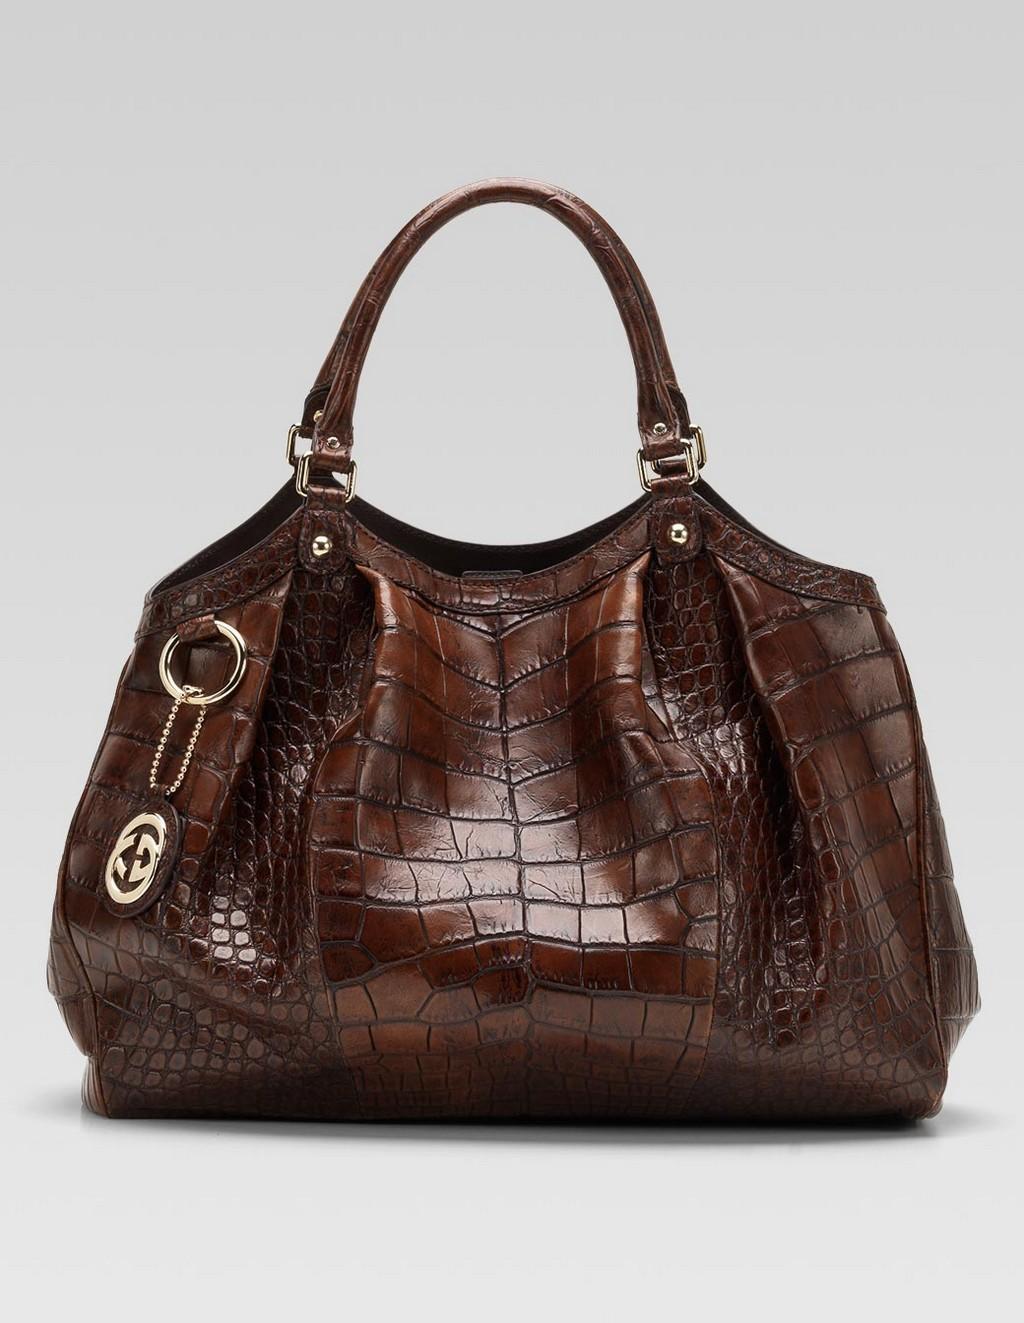 expensive designer purse designer coin purse designer purse online buy designer purse online